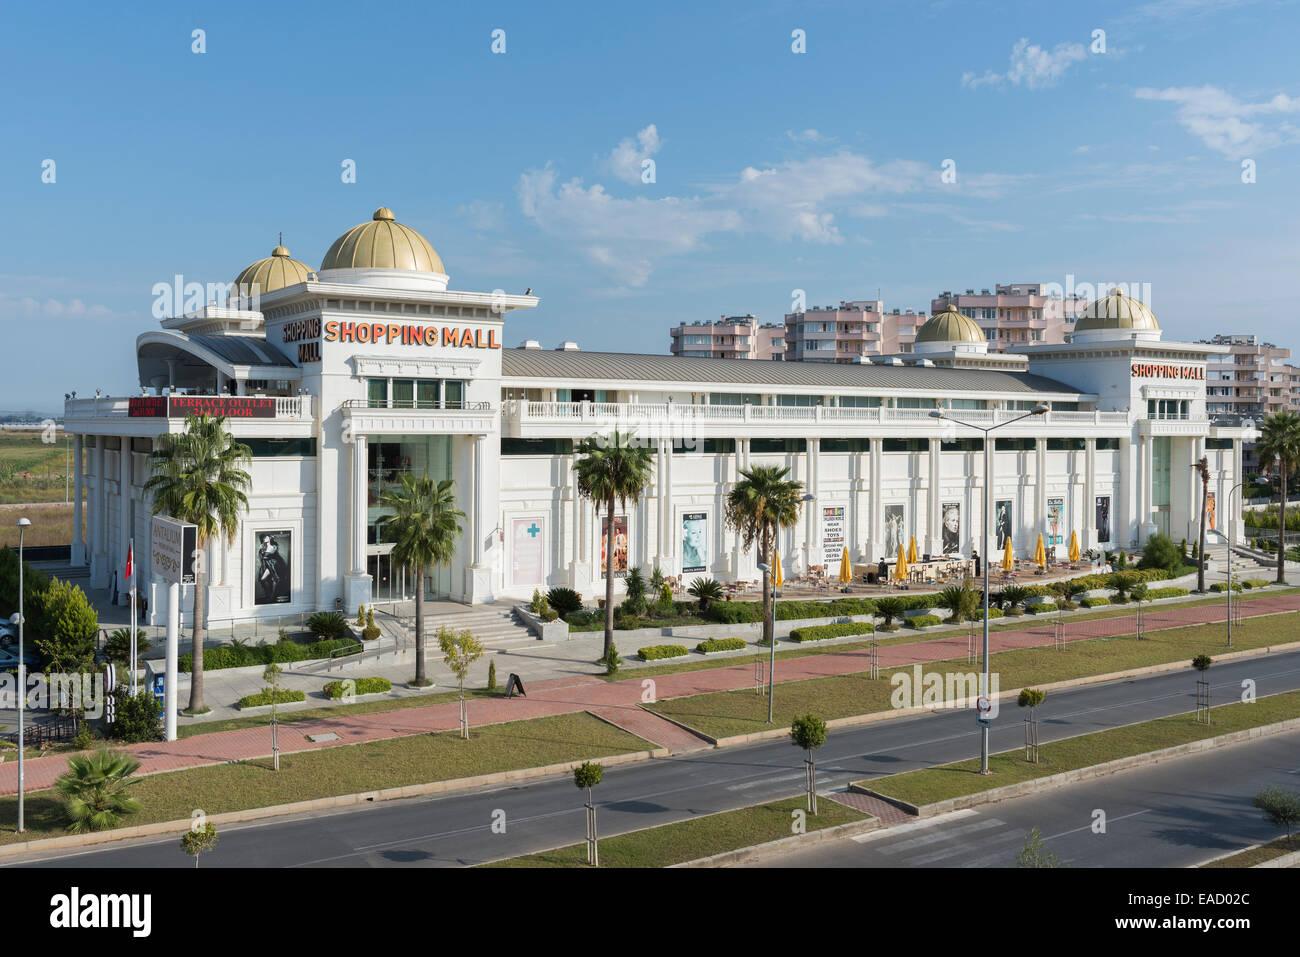 Shopping mall, Lara, Antalya, Turkey - Stock Image